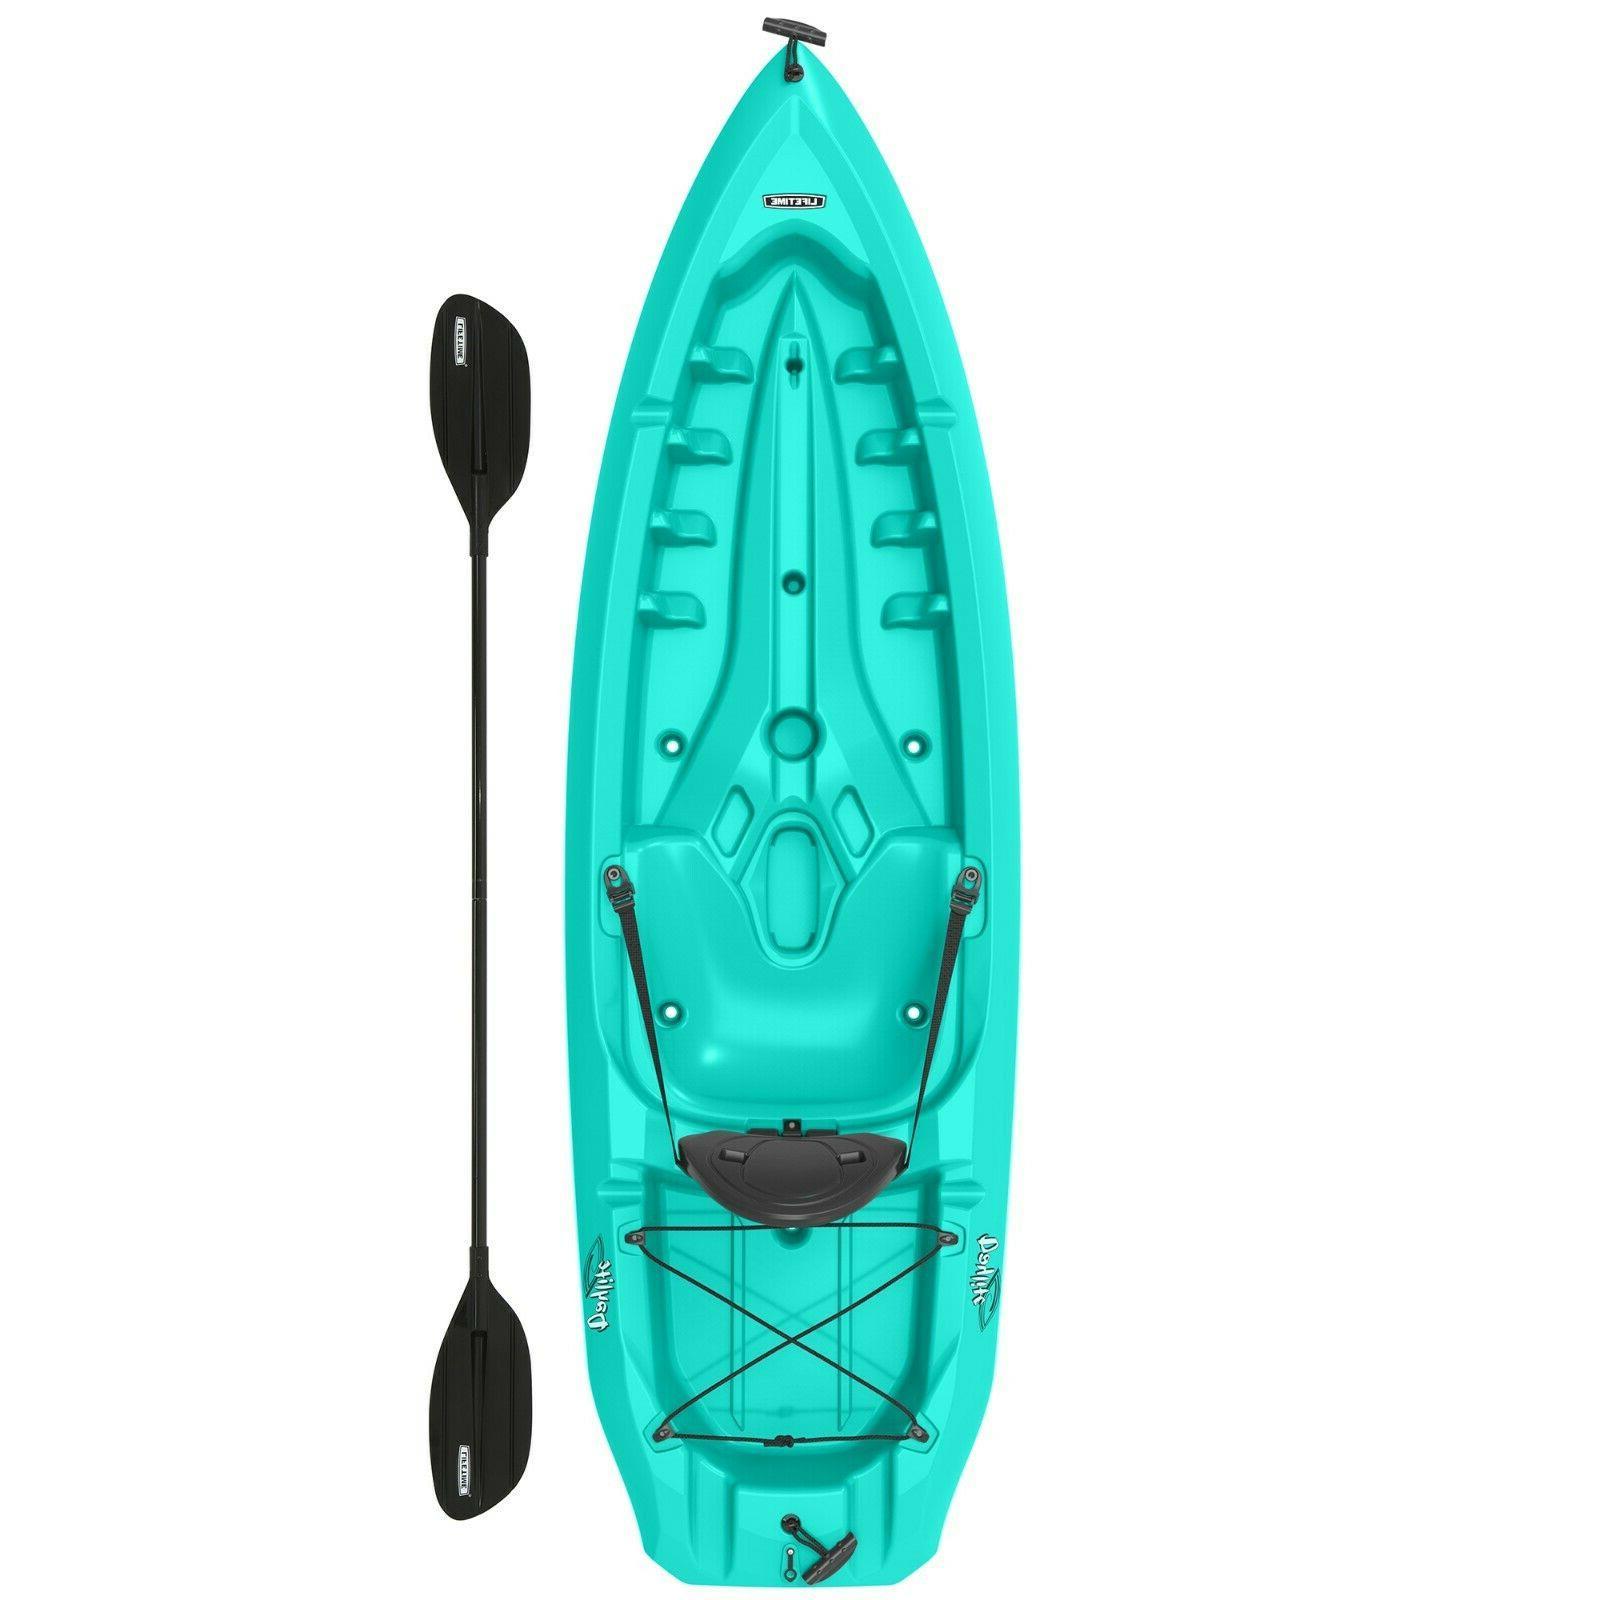 Lifetime Daylite 8 ft Sit-on-top Kayak